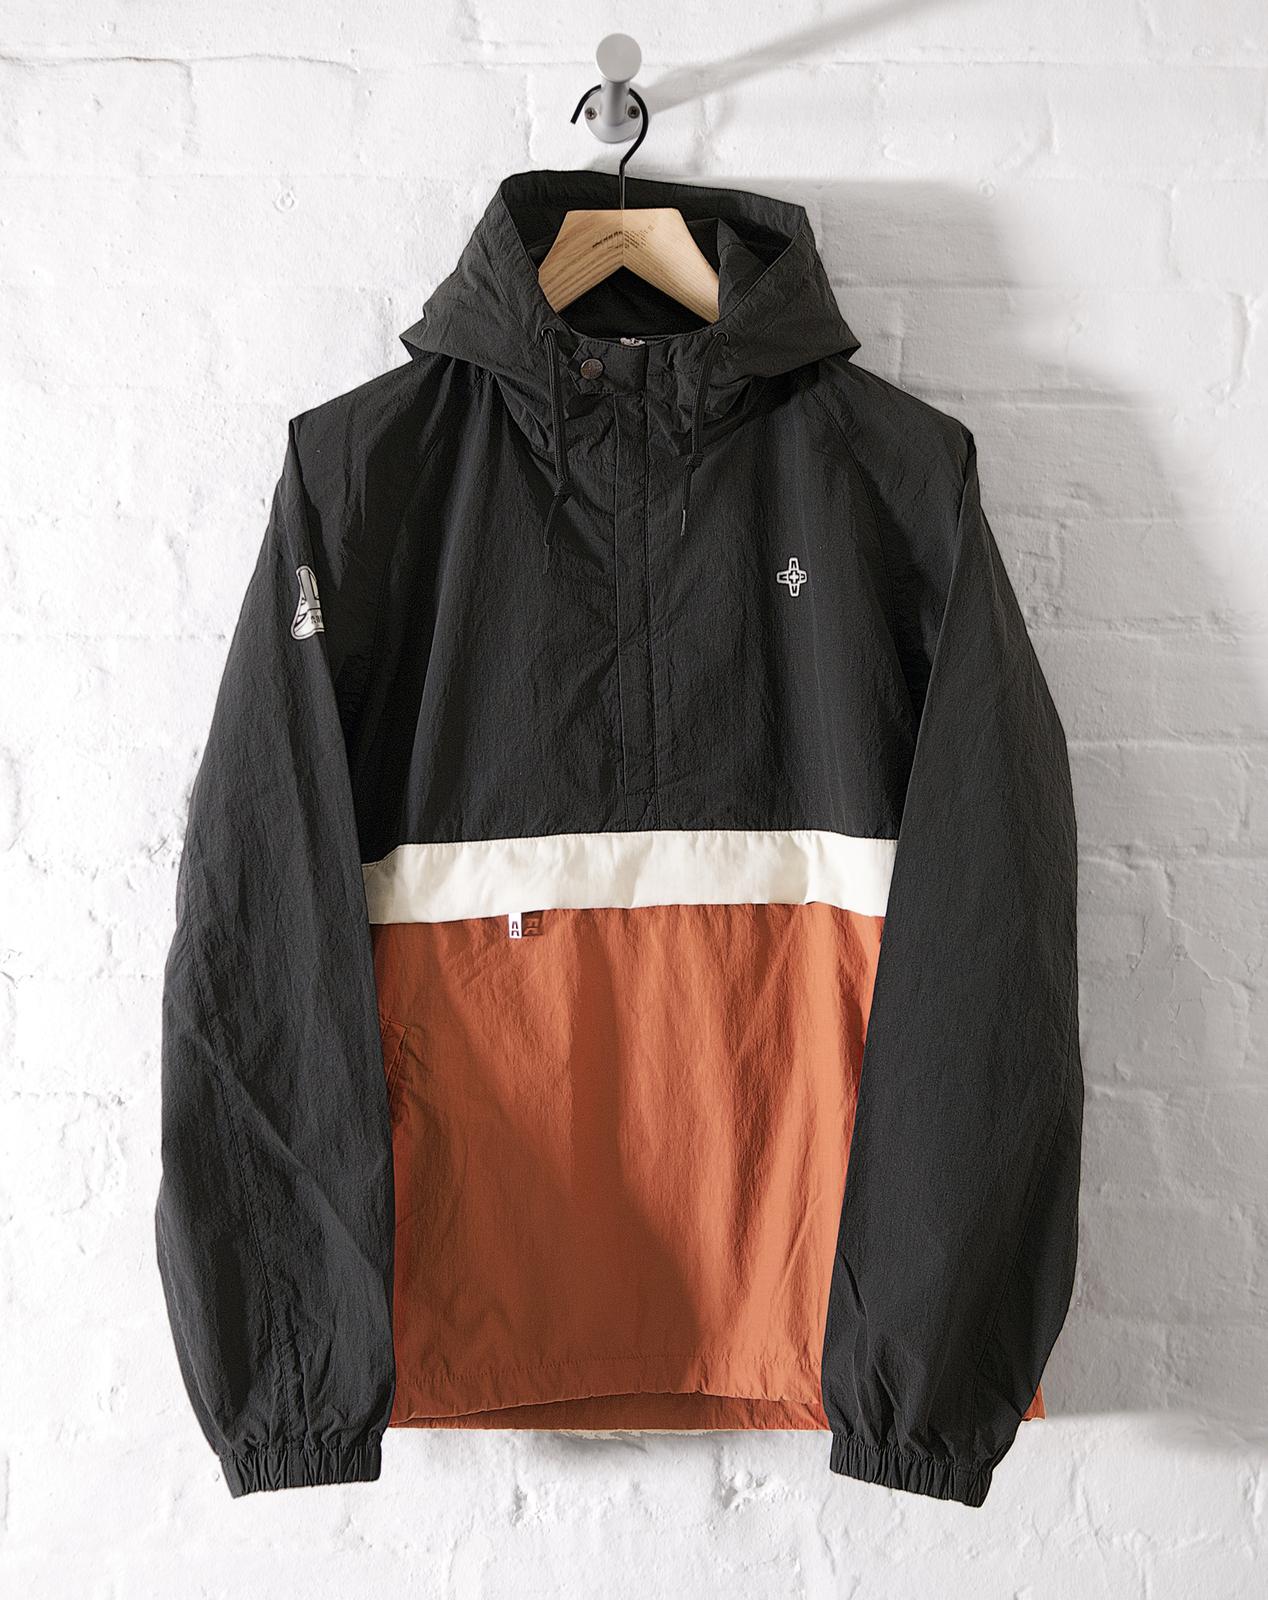 4727f5f8b Addict Mens Eavis Smock Half Zip Hooded Jacket Cotton/Nylon 80's ...